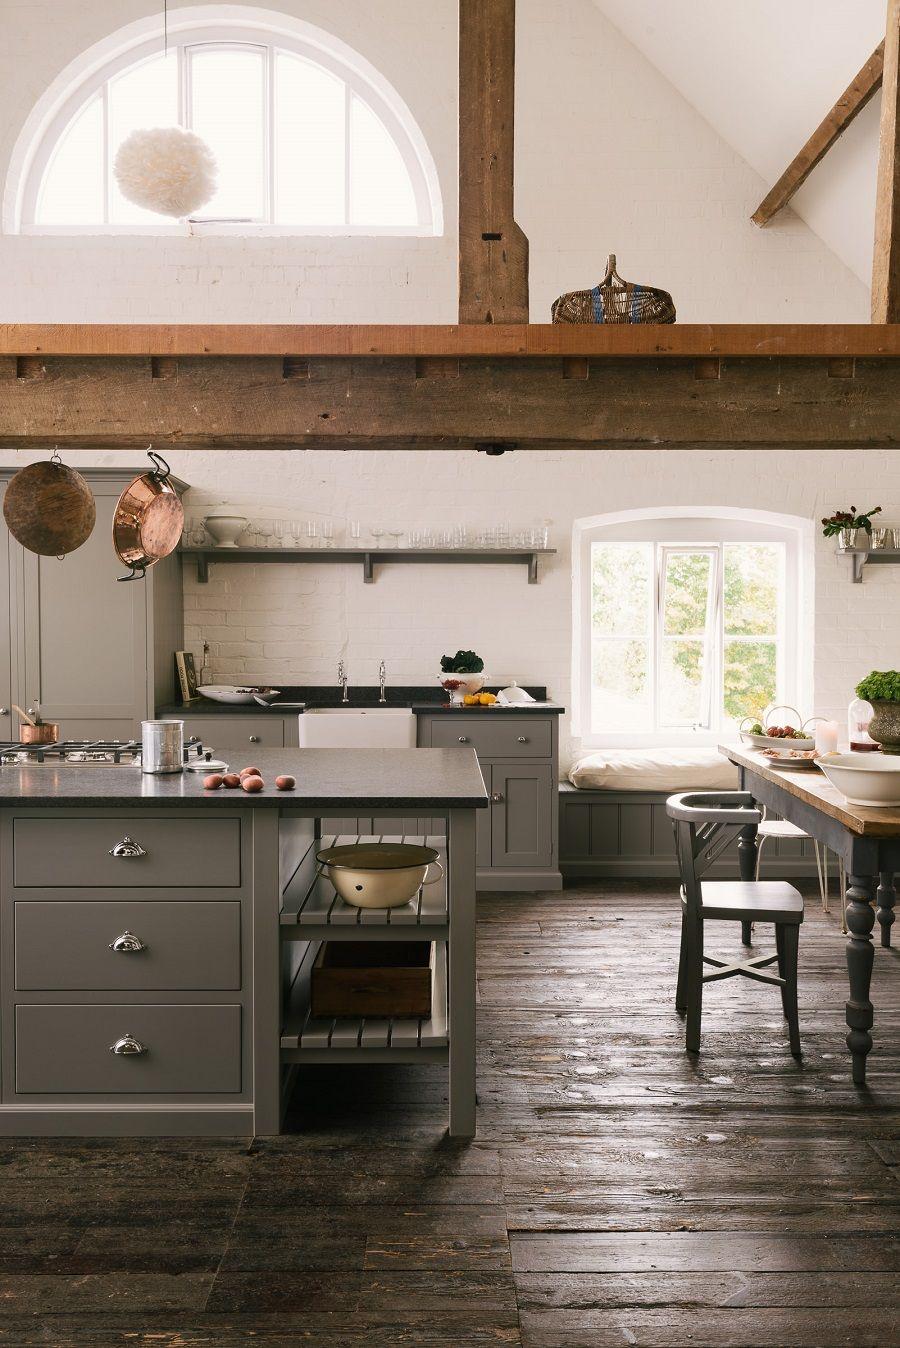 also cleaning kitchen shelves bloggers  best diy ideas pinterest rh